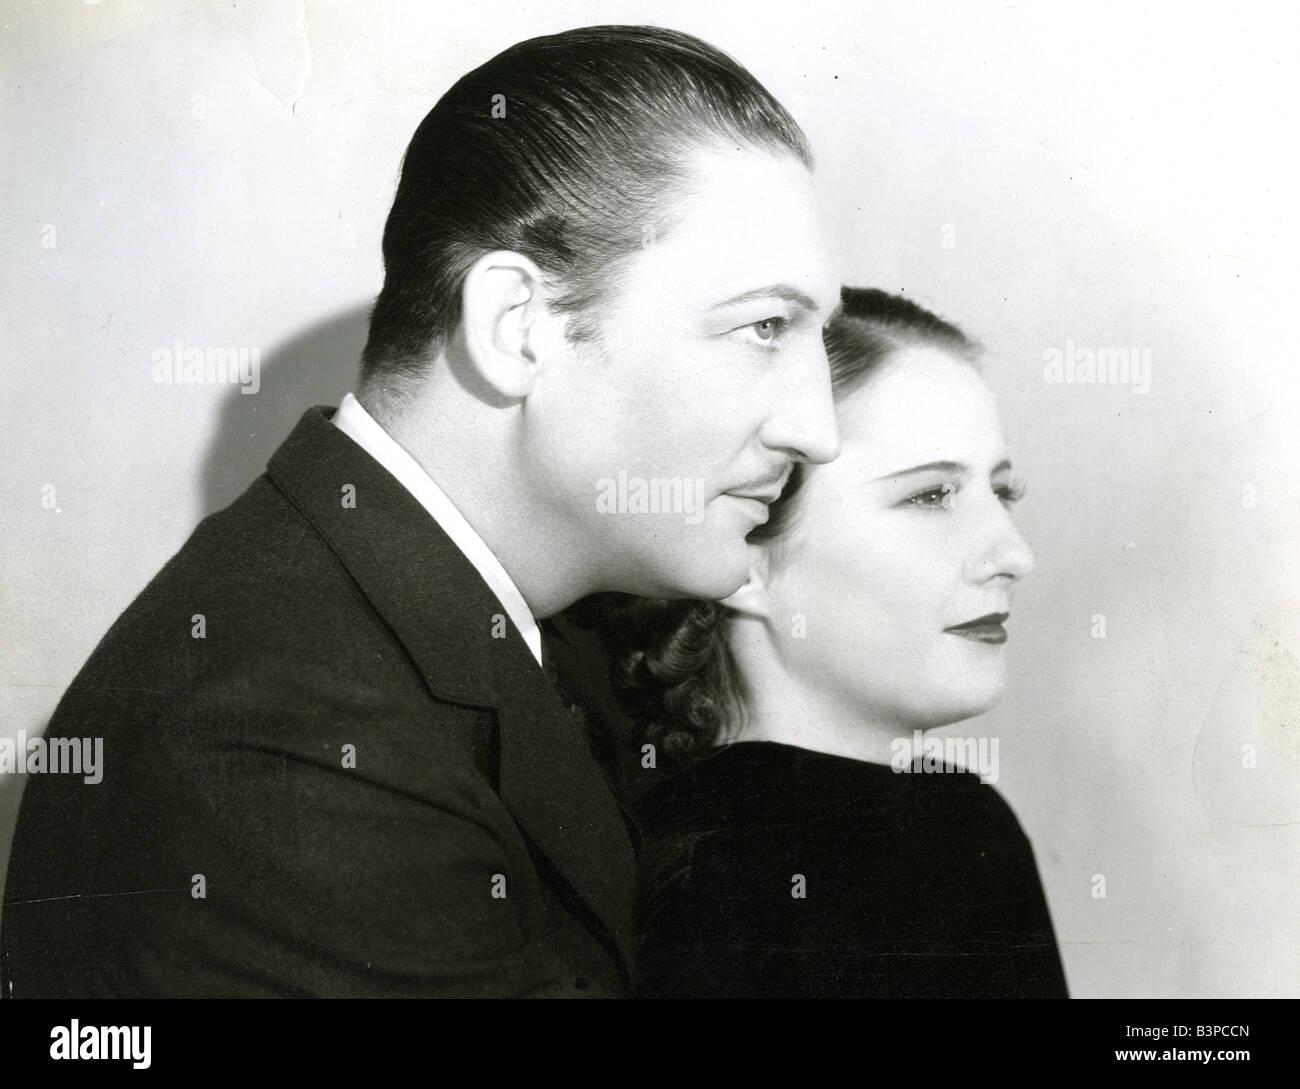 THE SECRET BRIDE 1935 Warner film with Barbara Stanwyck and Warren William - Stock Image